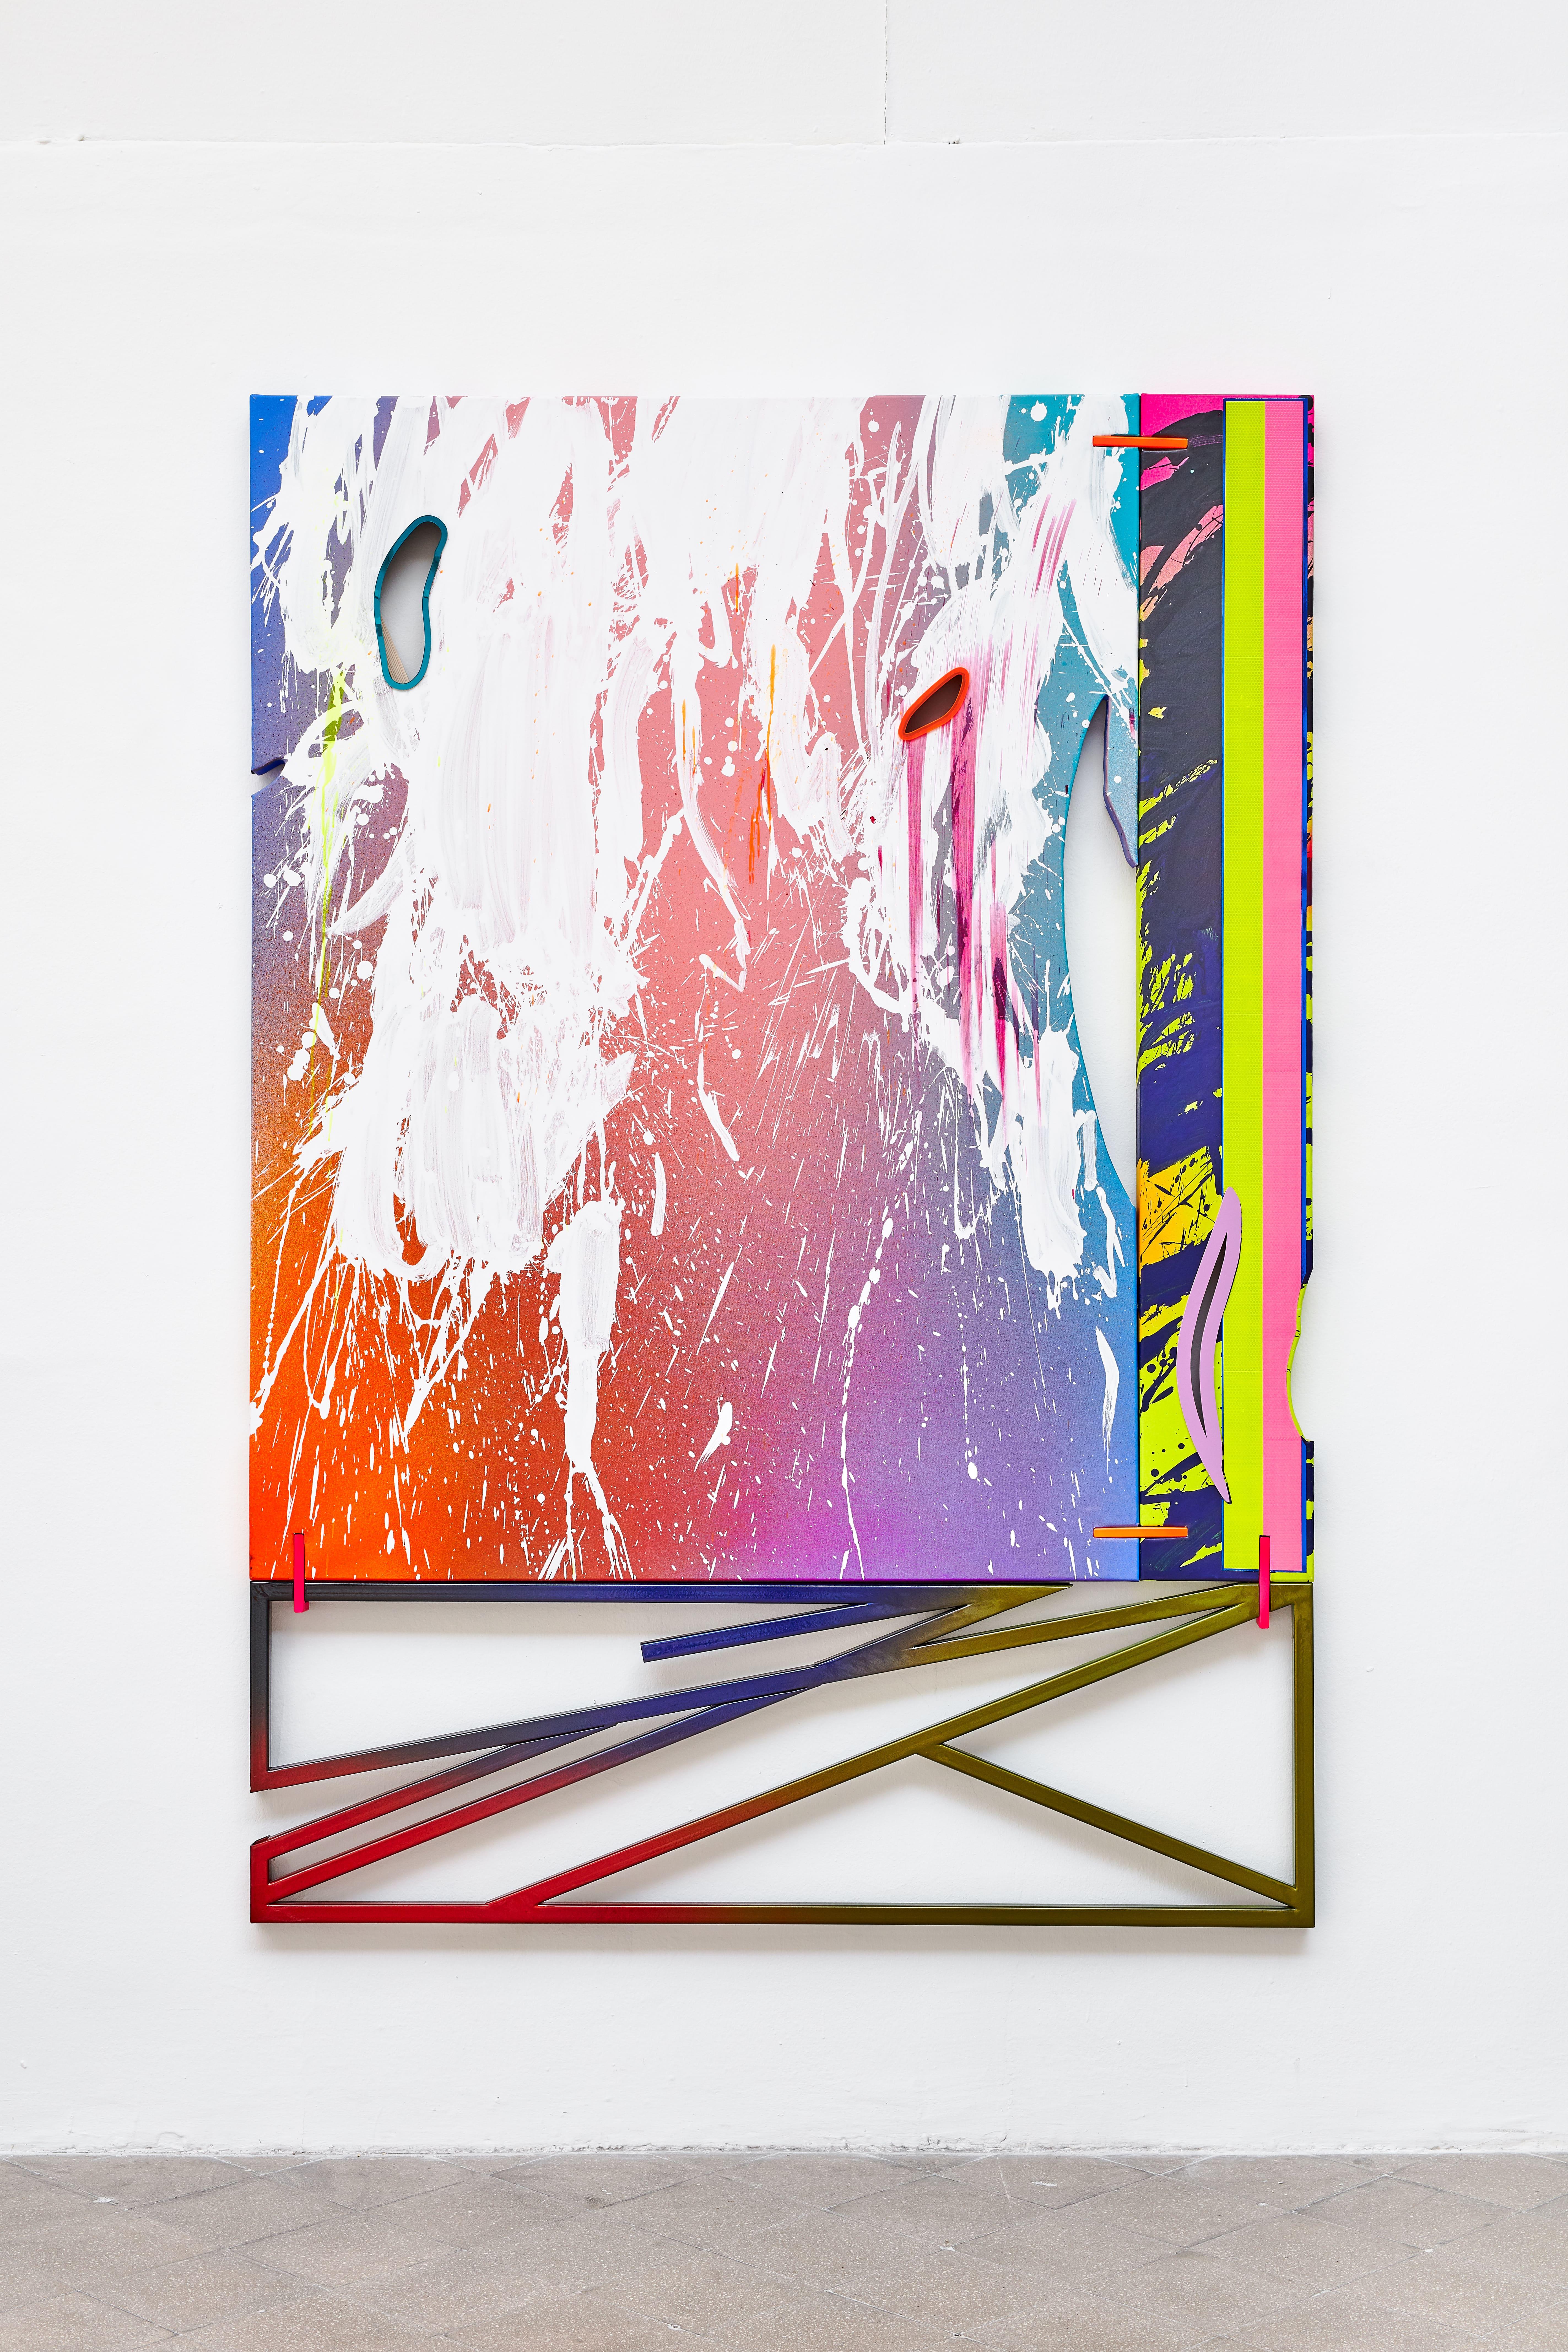 NemesM_Tomorrow-14_2019_196x136cm_steel-carpaint-lasercut-perspex-light-reflective-vinyl-mirror-paper-acrylic-canvas-wood-min